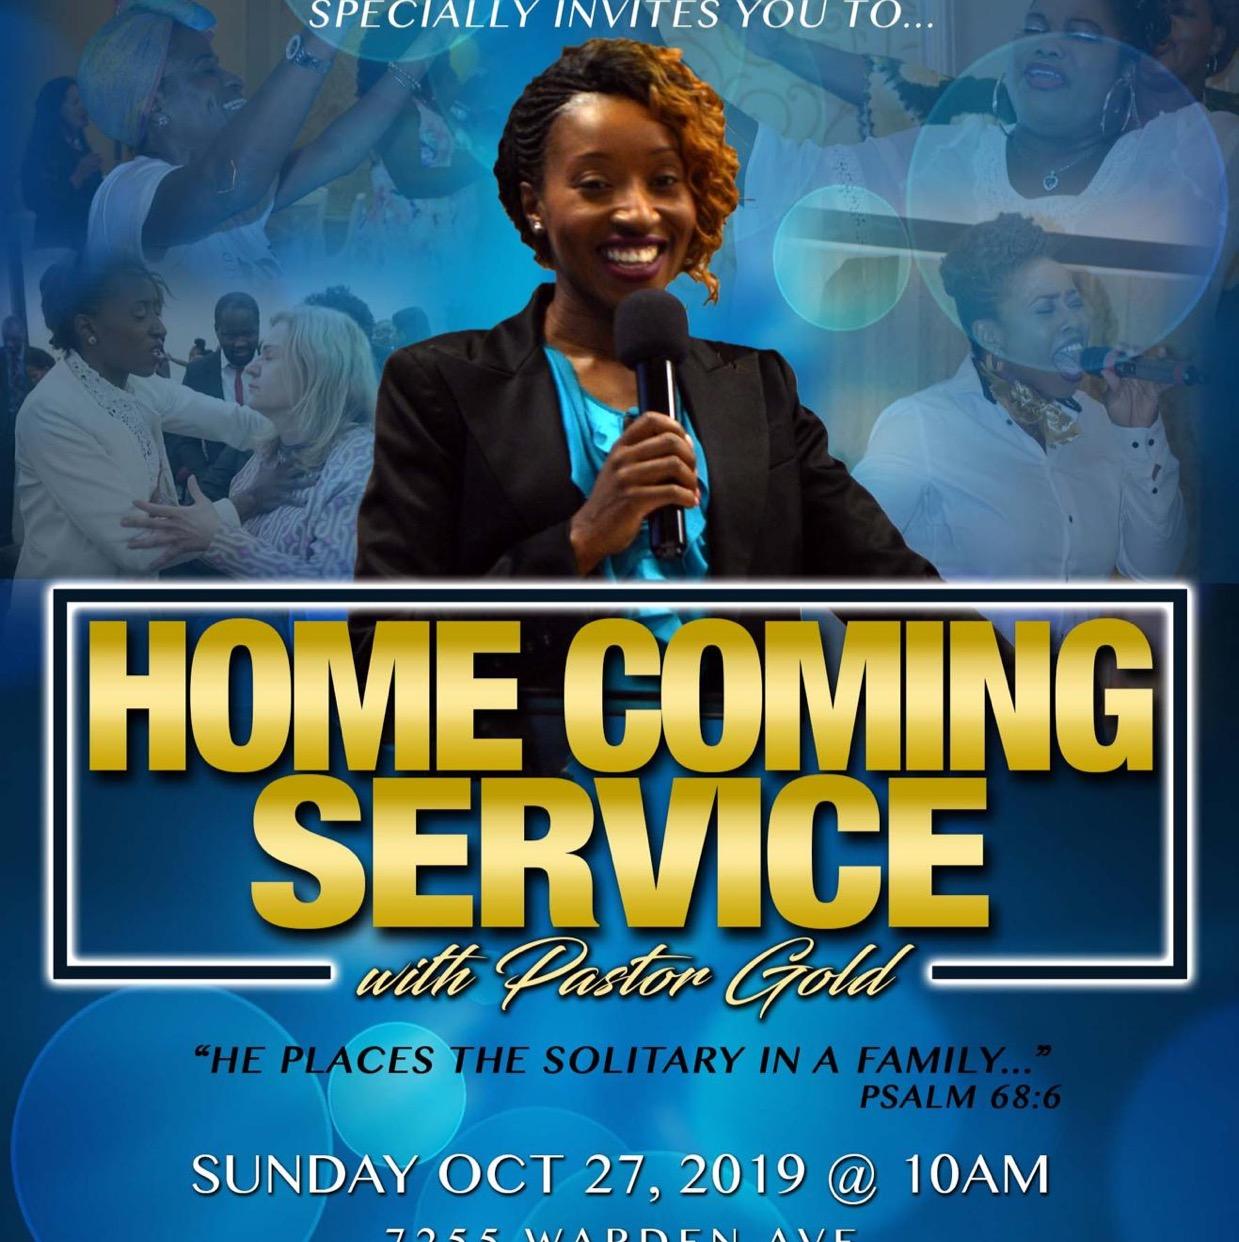 Amazing program, Home coming Service